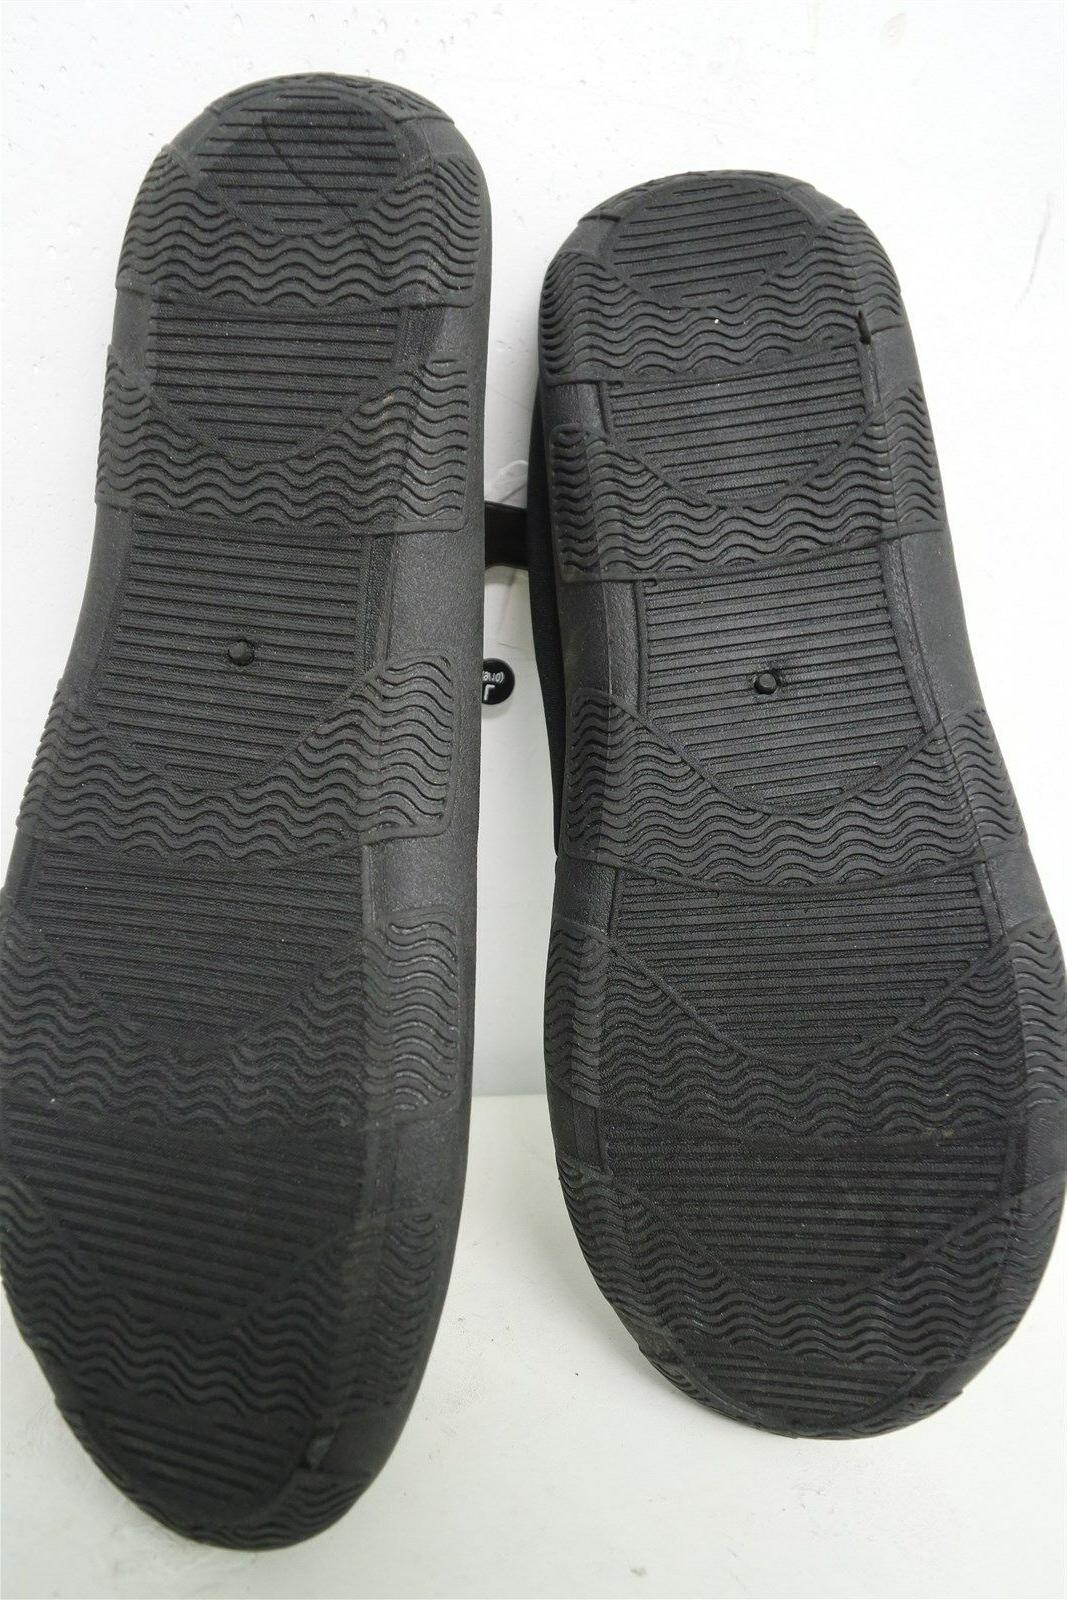 NEW! Women's Blue Water Shoe slip-on slides L wms